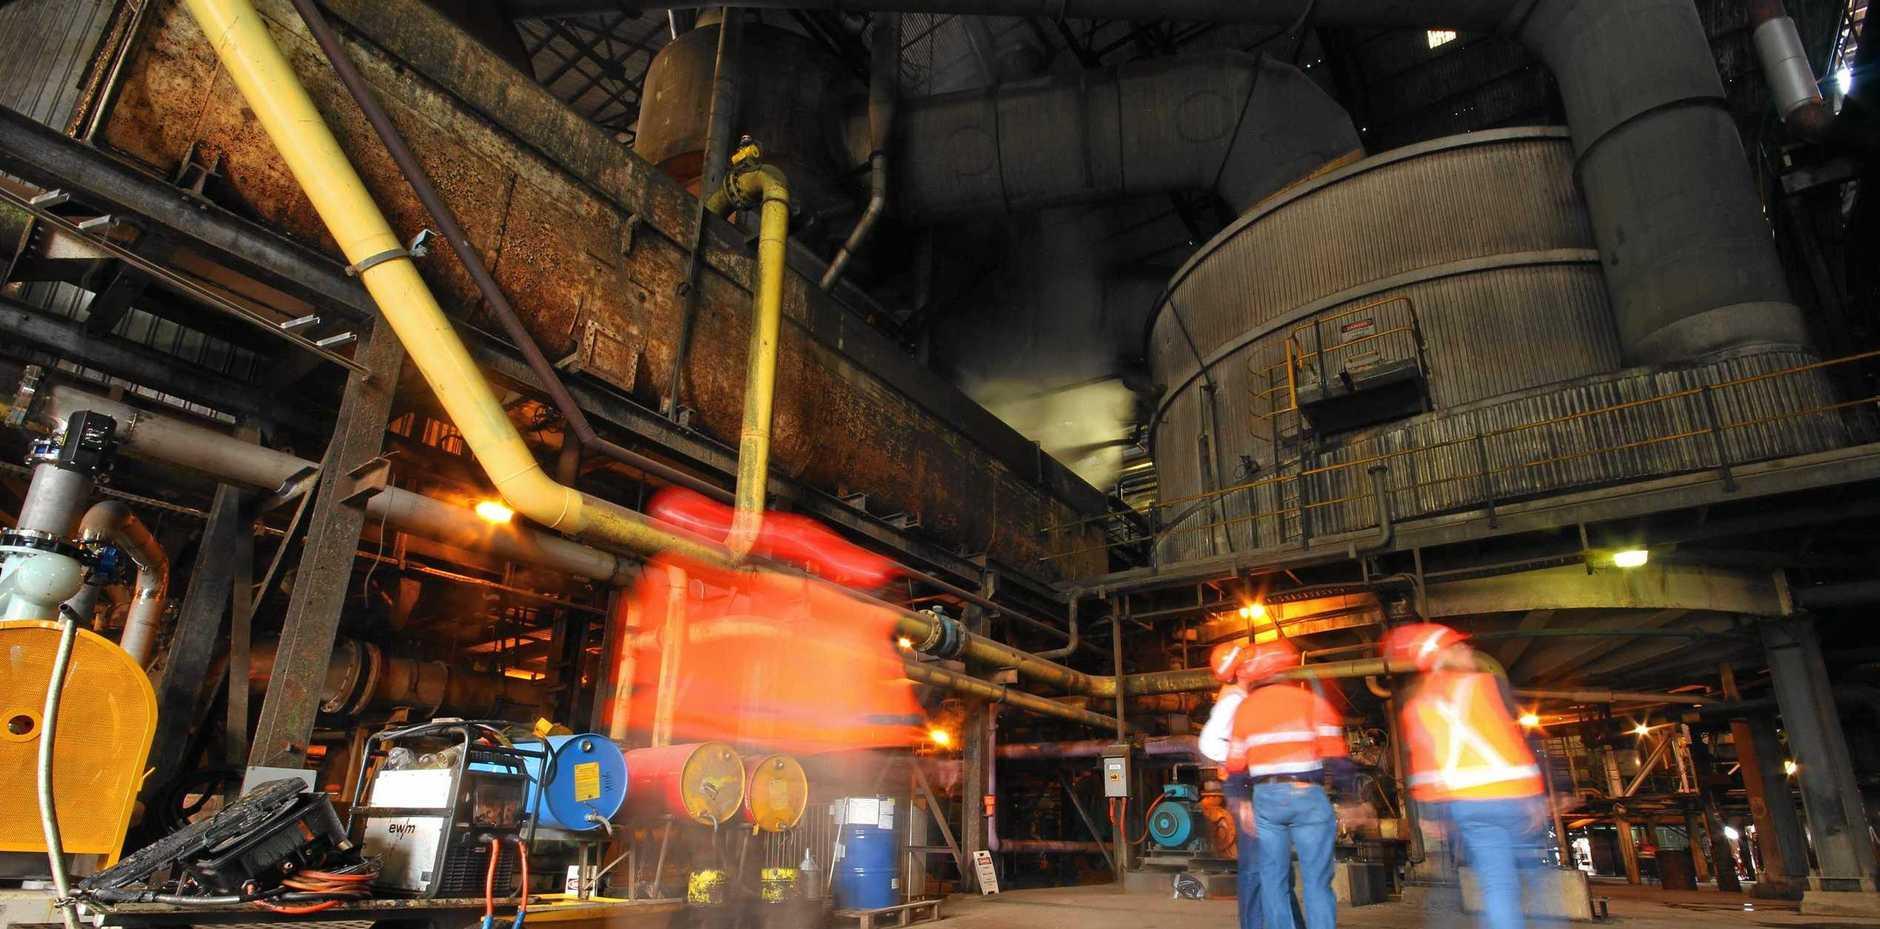 MILESTONE: Wilmar Sugar reports performance of mills at halfway mark of season.